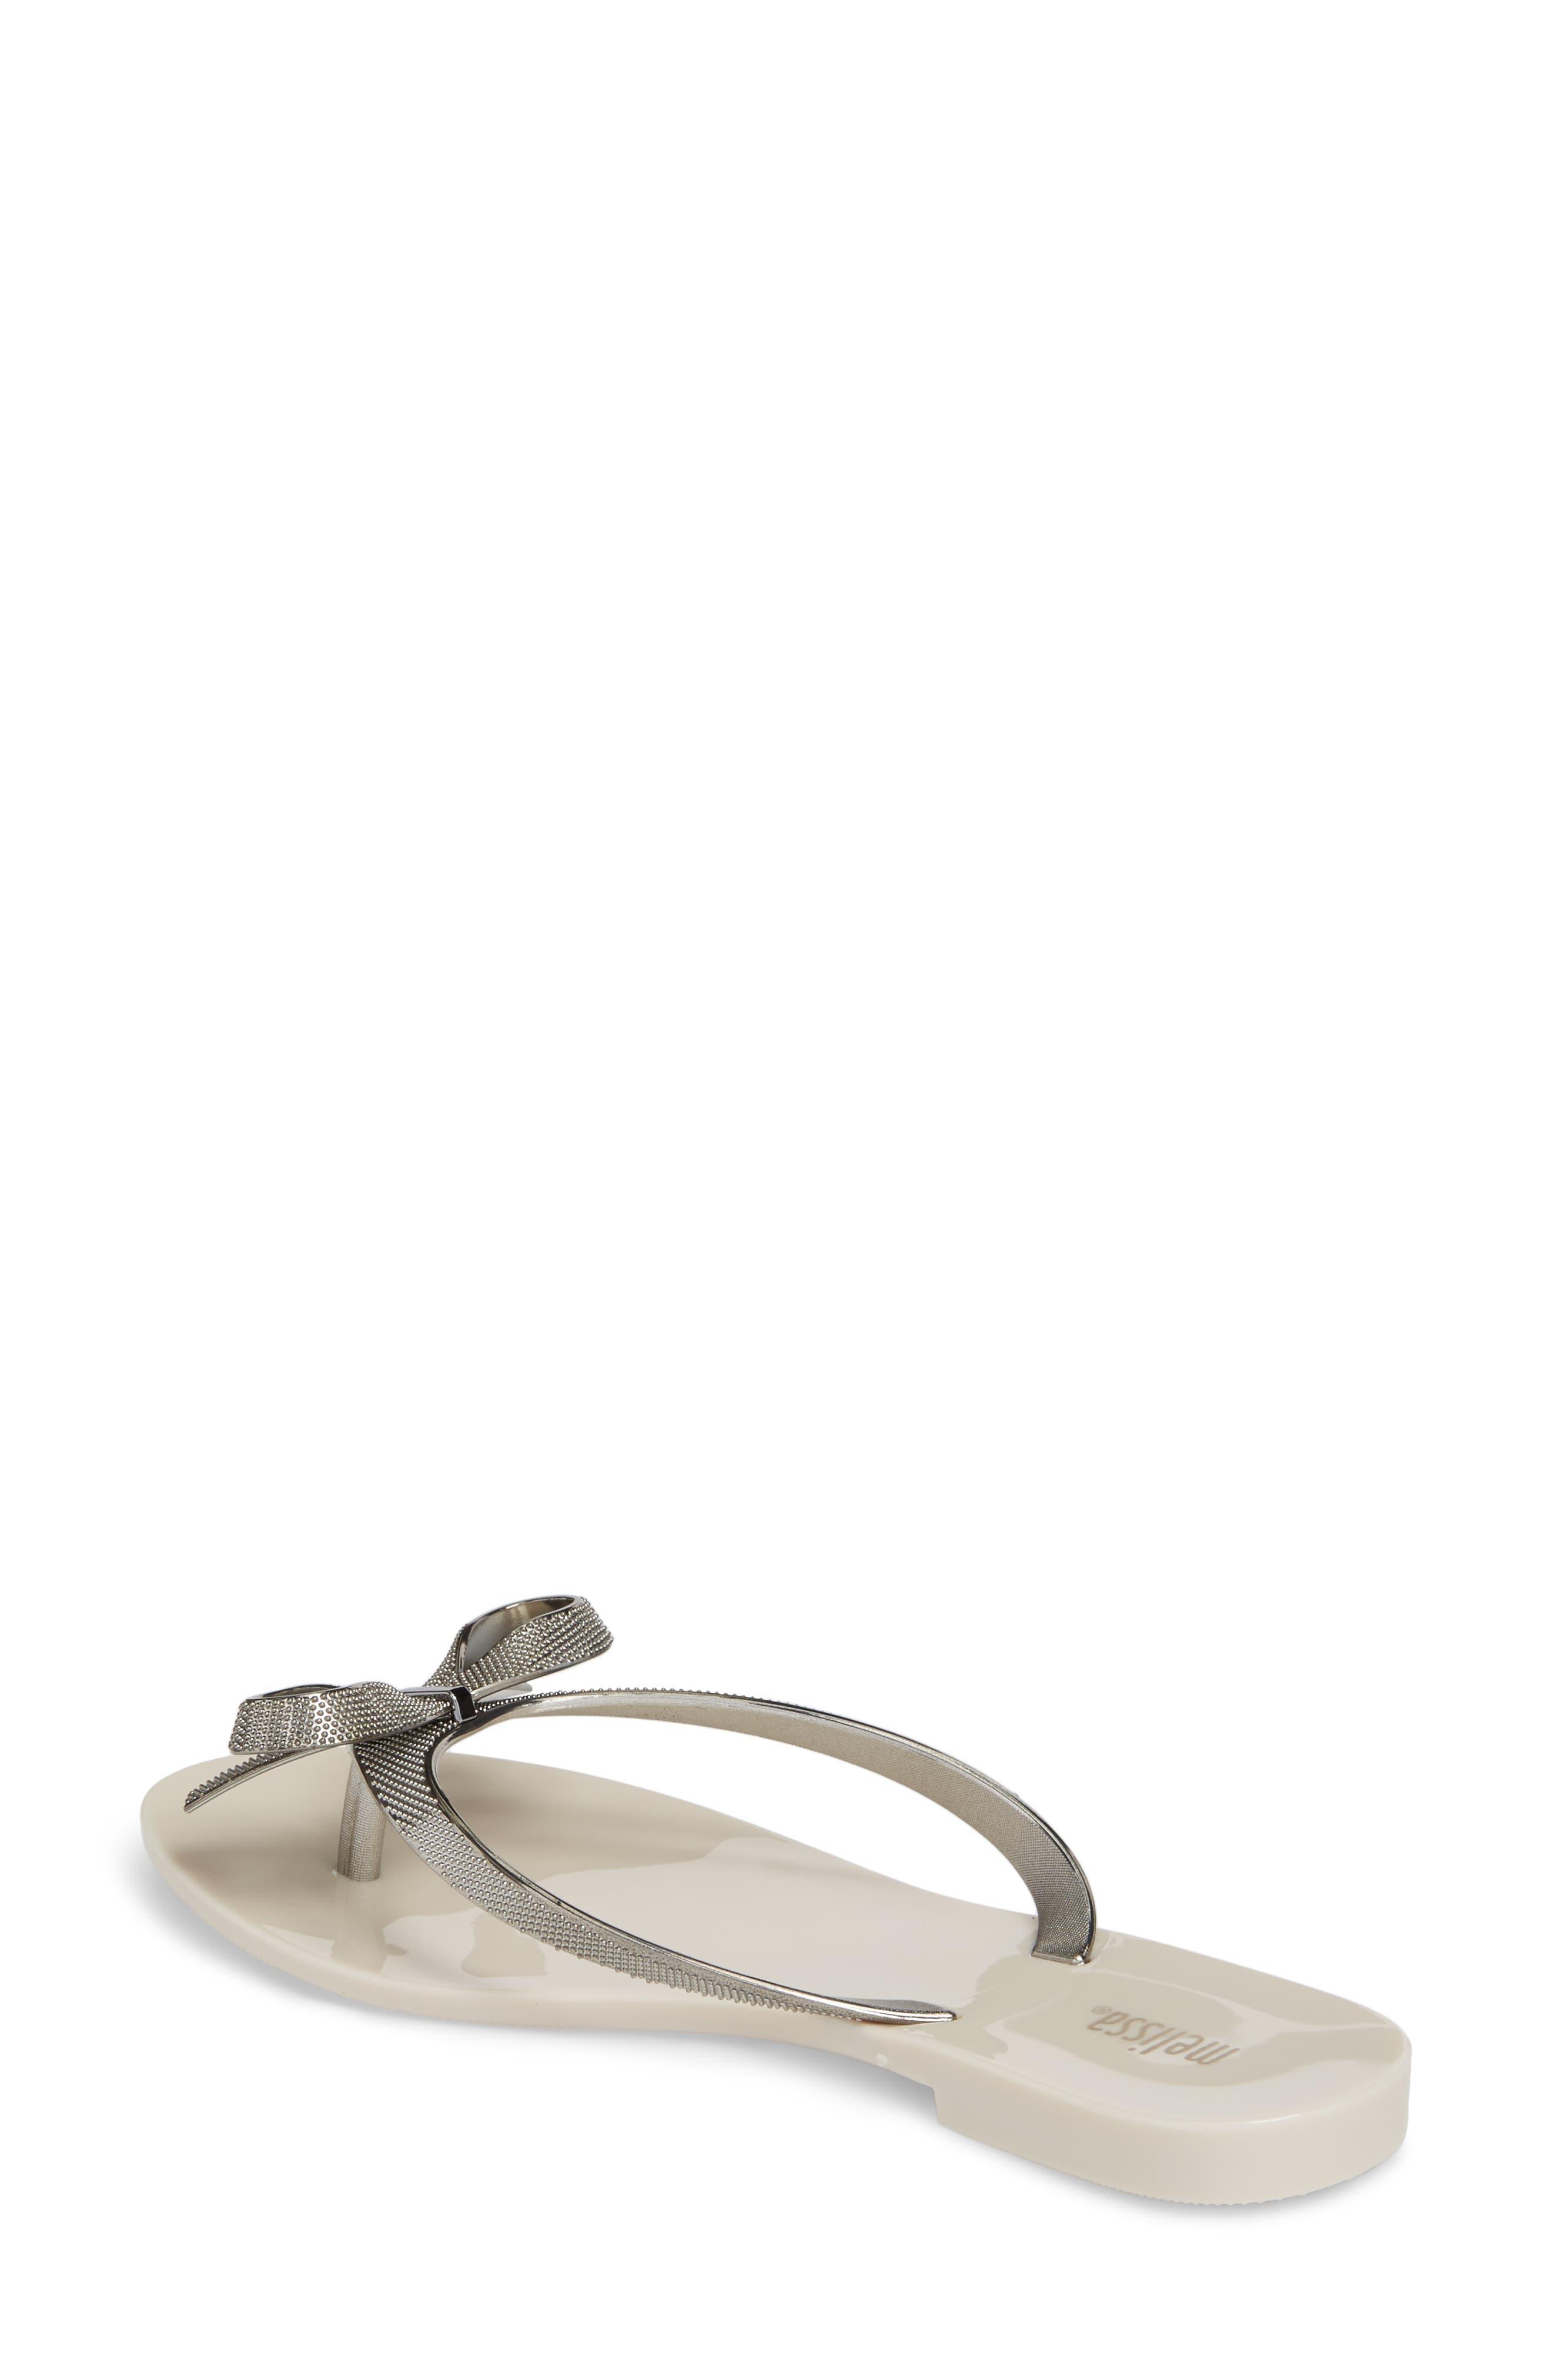 Harmonic Bow Chrome II Sandal,                             Alternate thumbnail 2, color,                             040